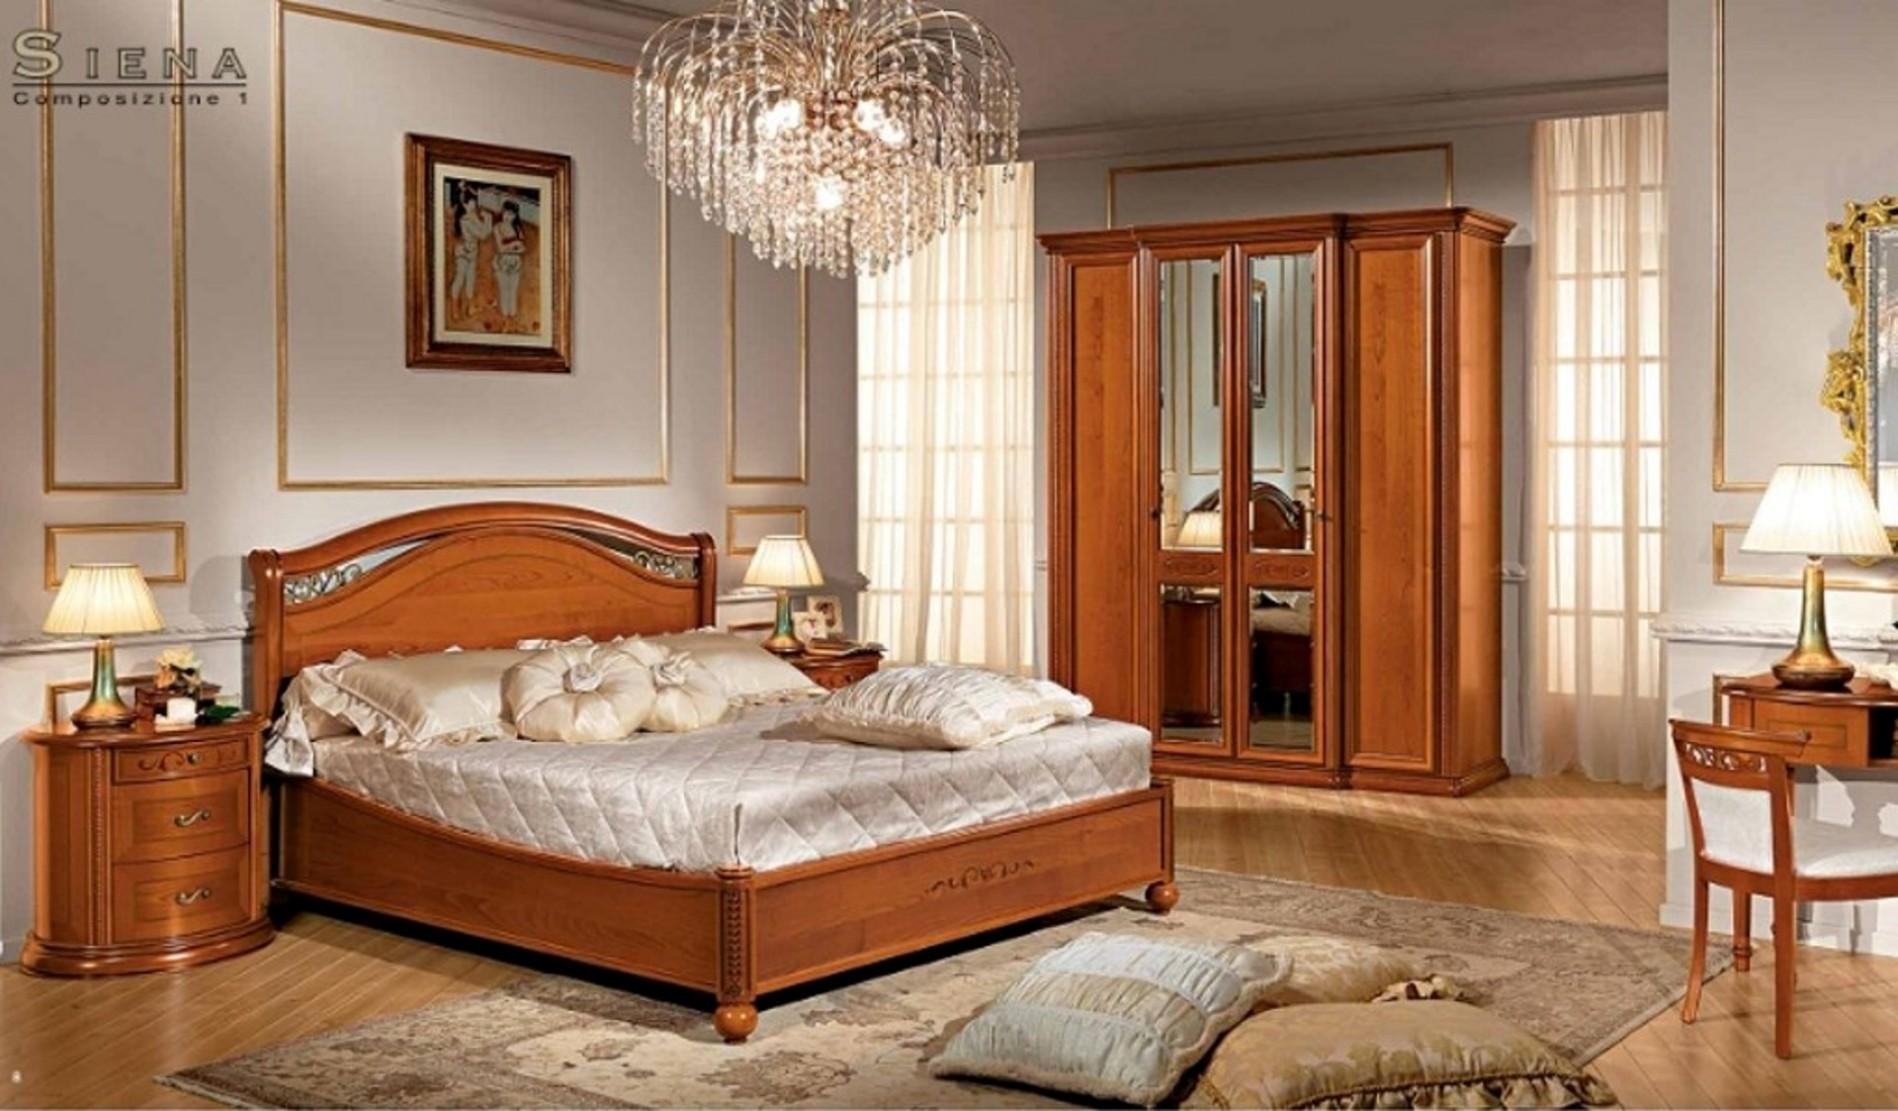 Schlafzimmer Siena - mobili italiani, italienische möbel